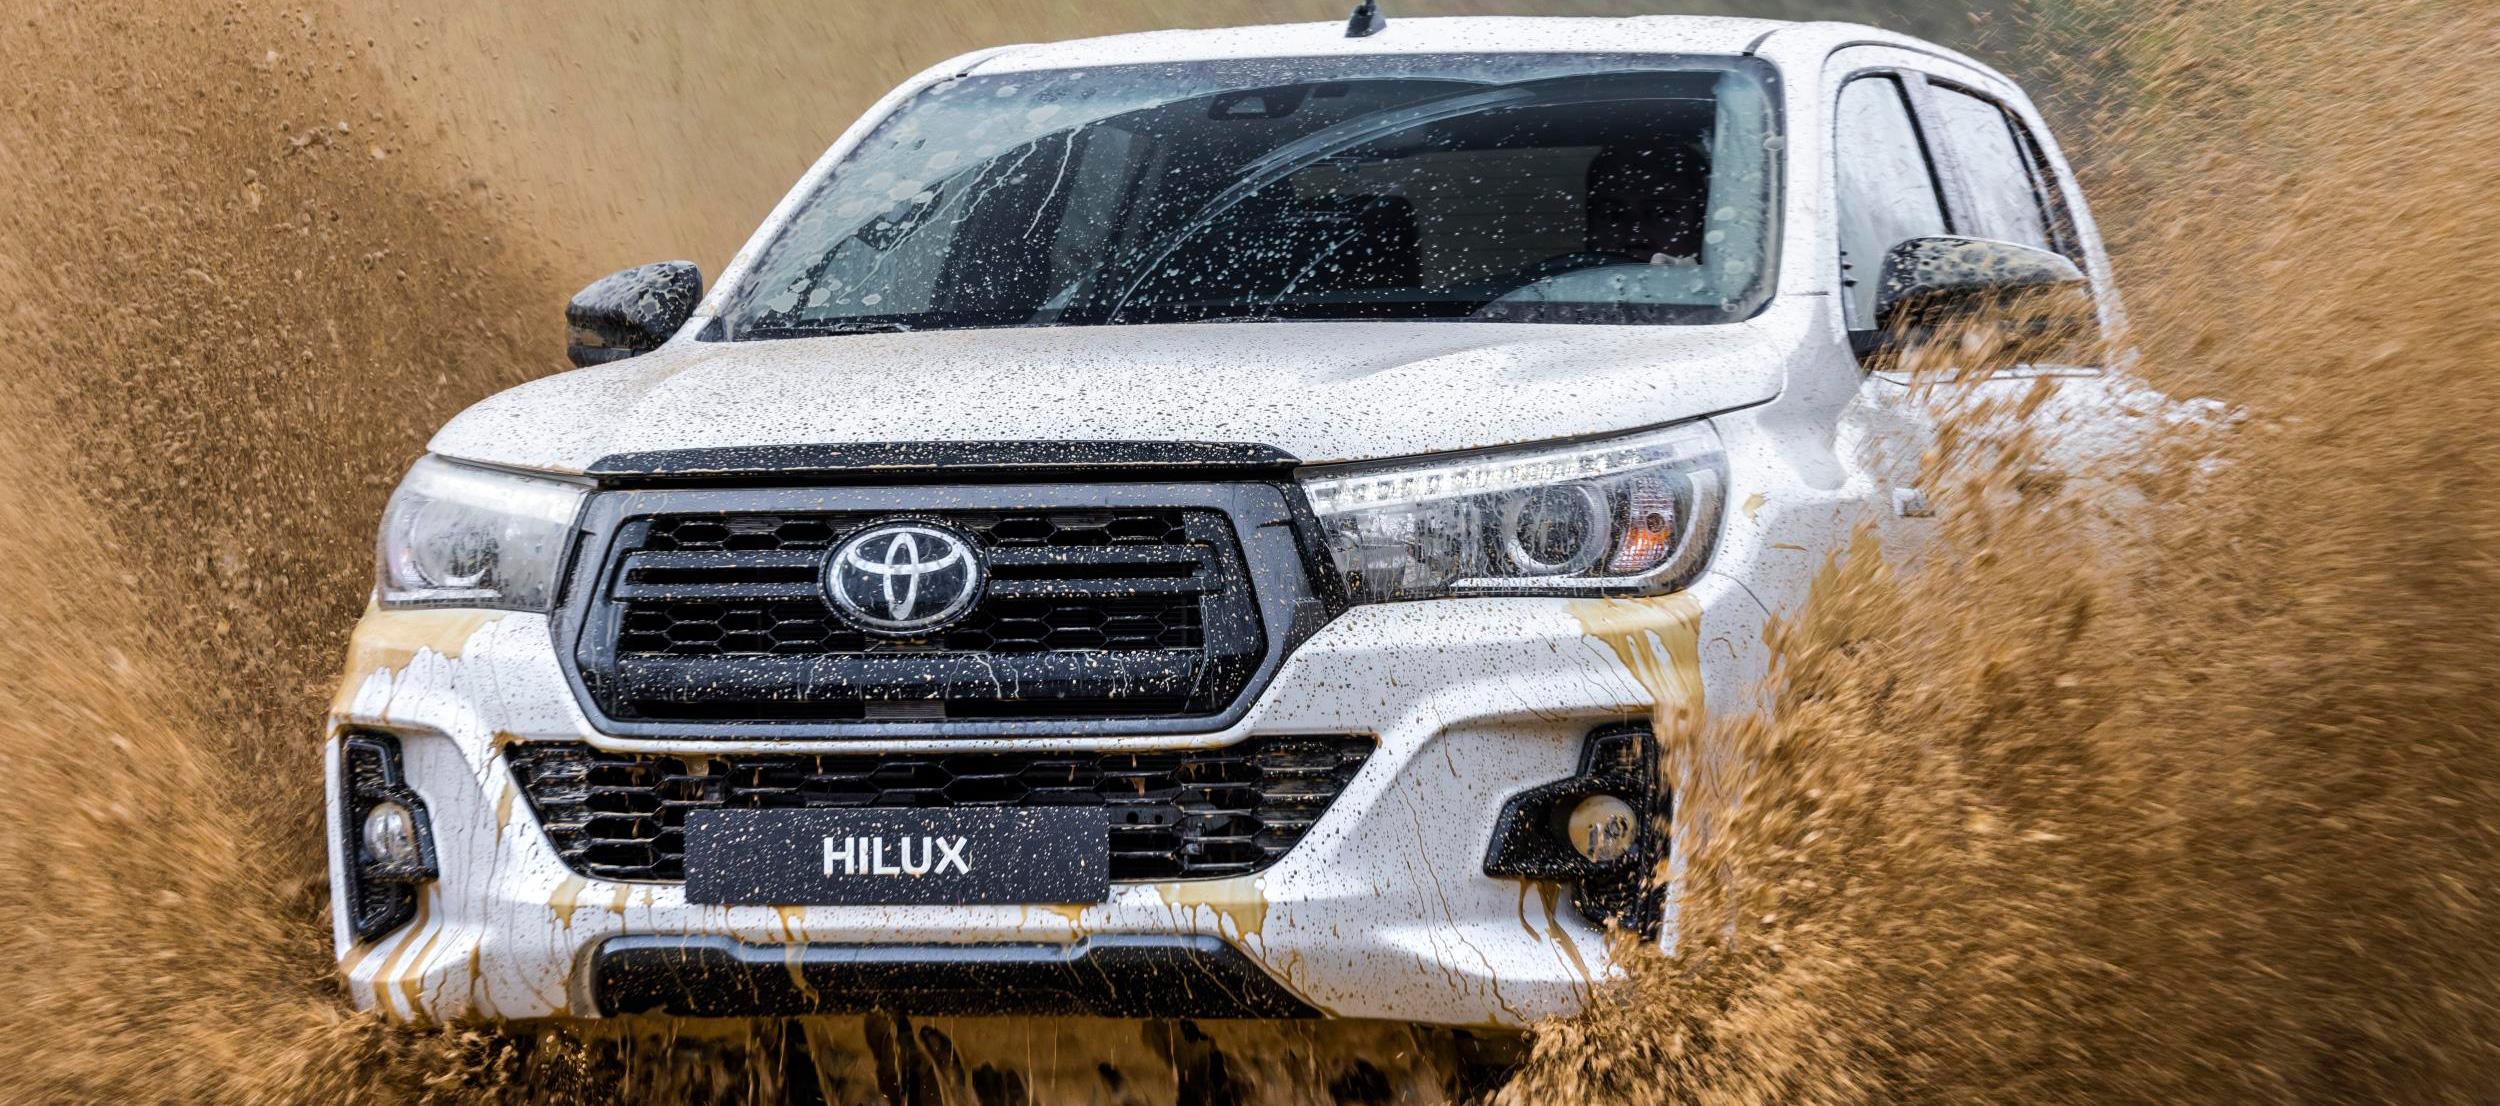 Toyota Hilux Legend Black, lo nuevo de la pick up de Toyota